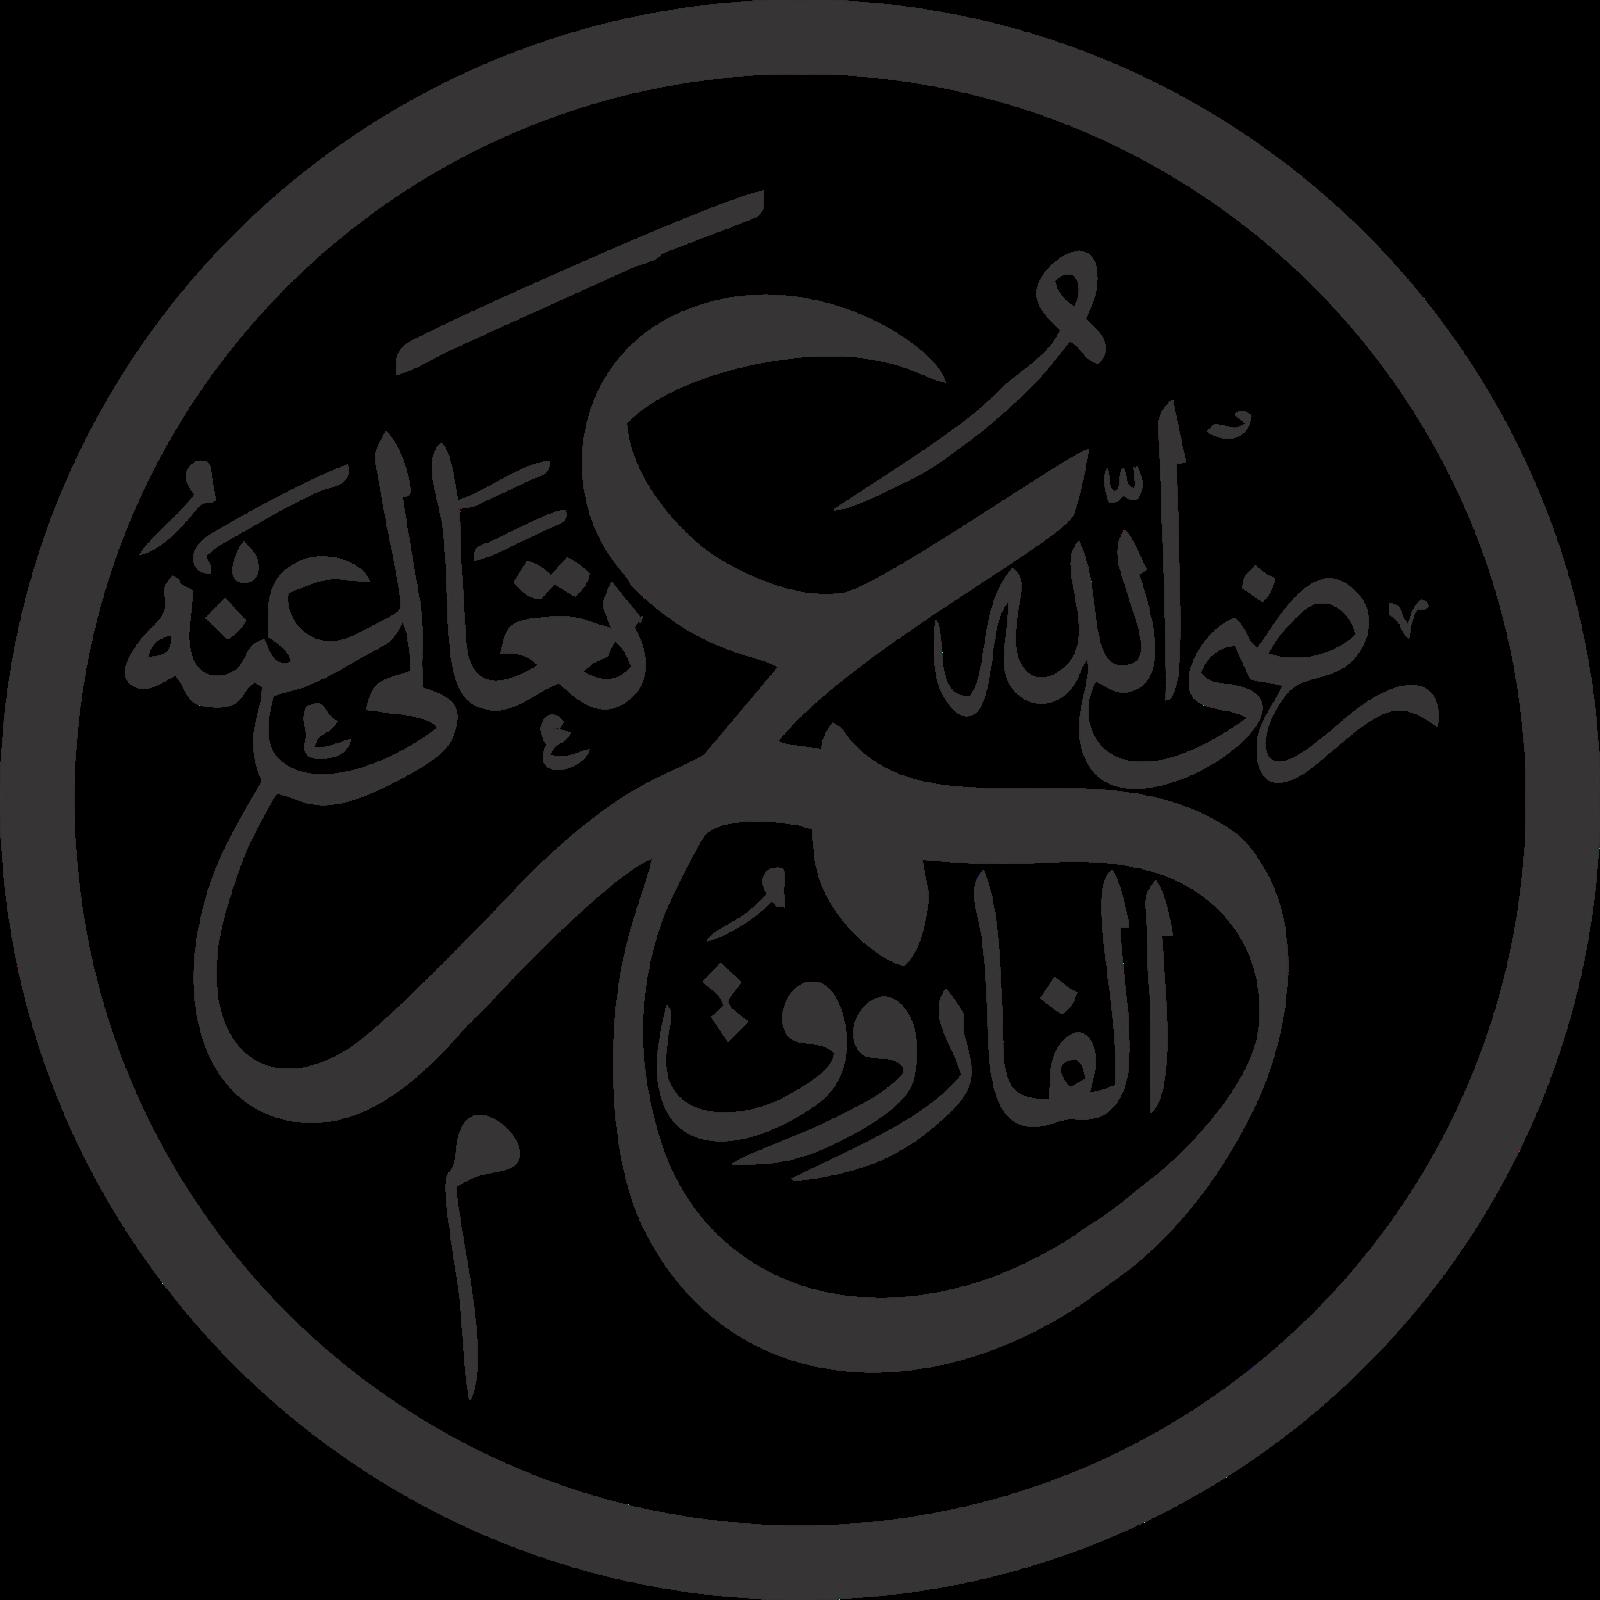 Abu Bakar Ali Net Worth